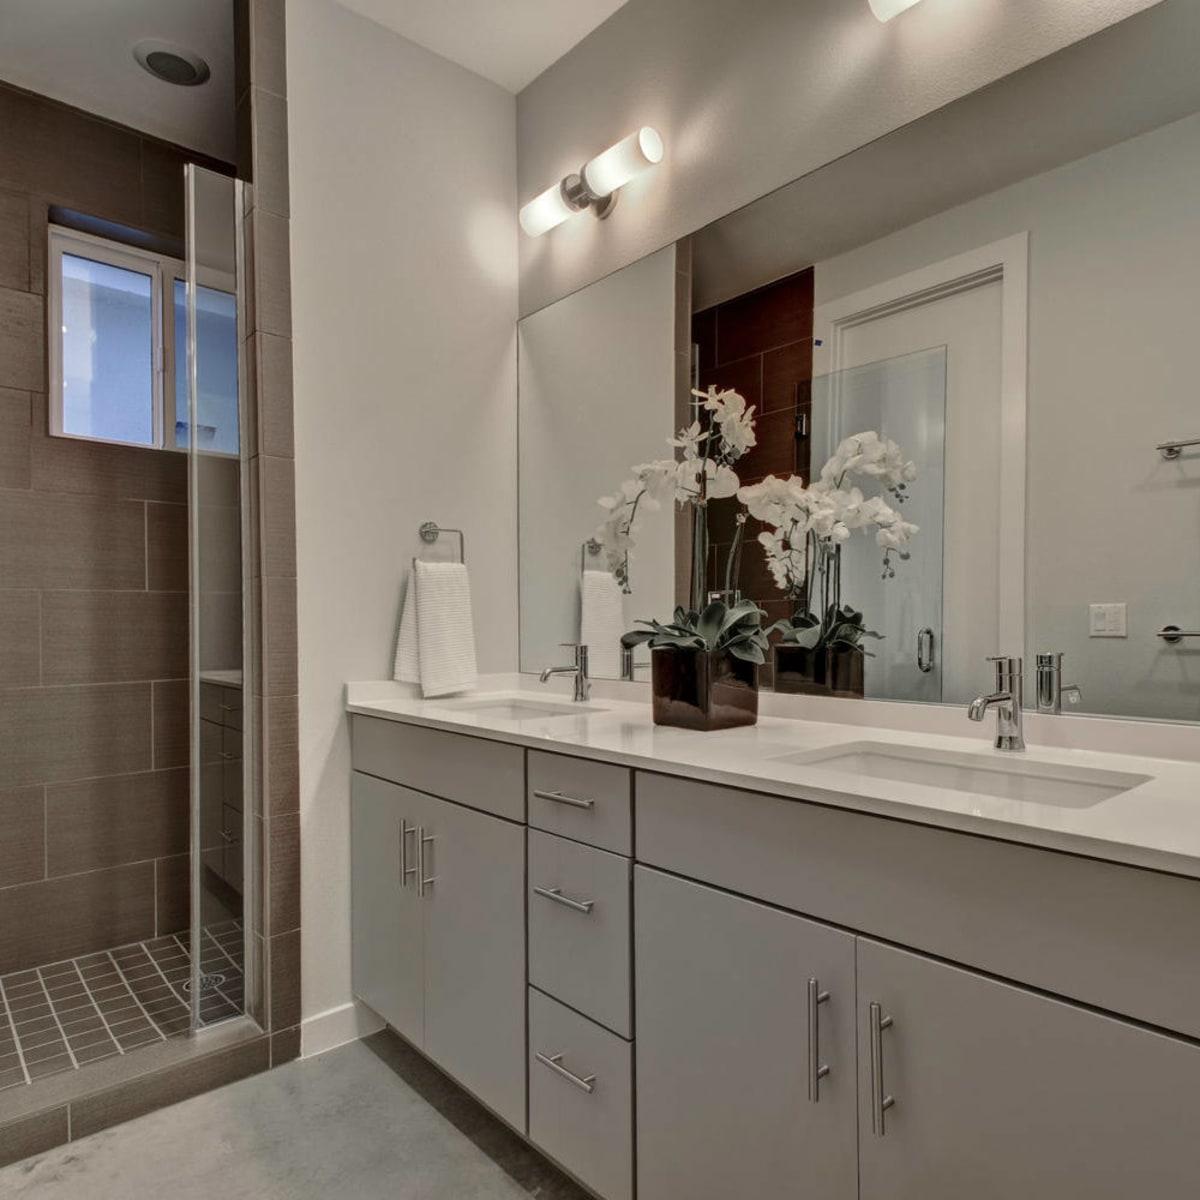 Honeysuckle bathroom